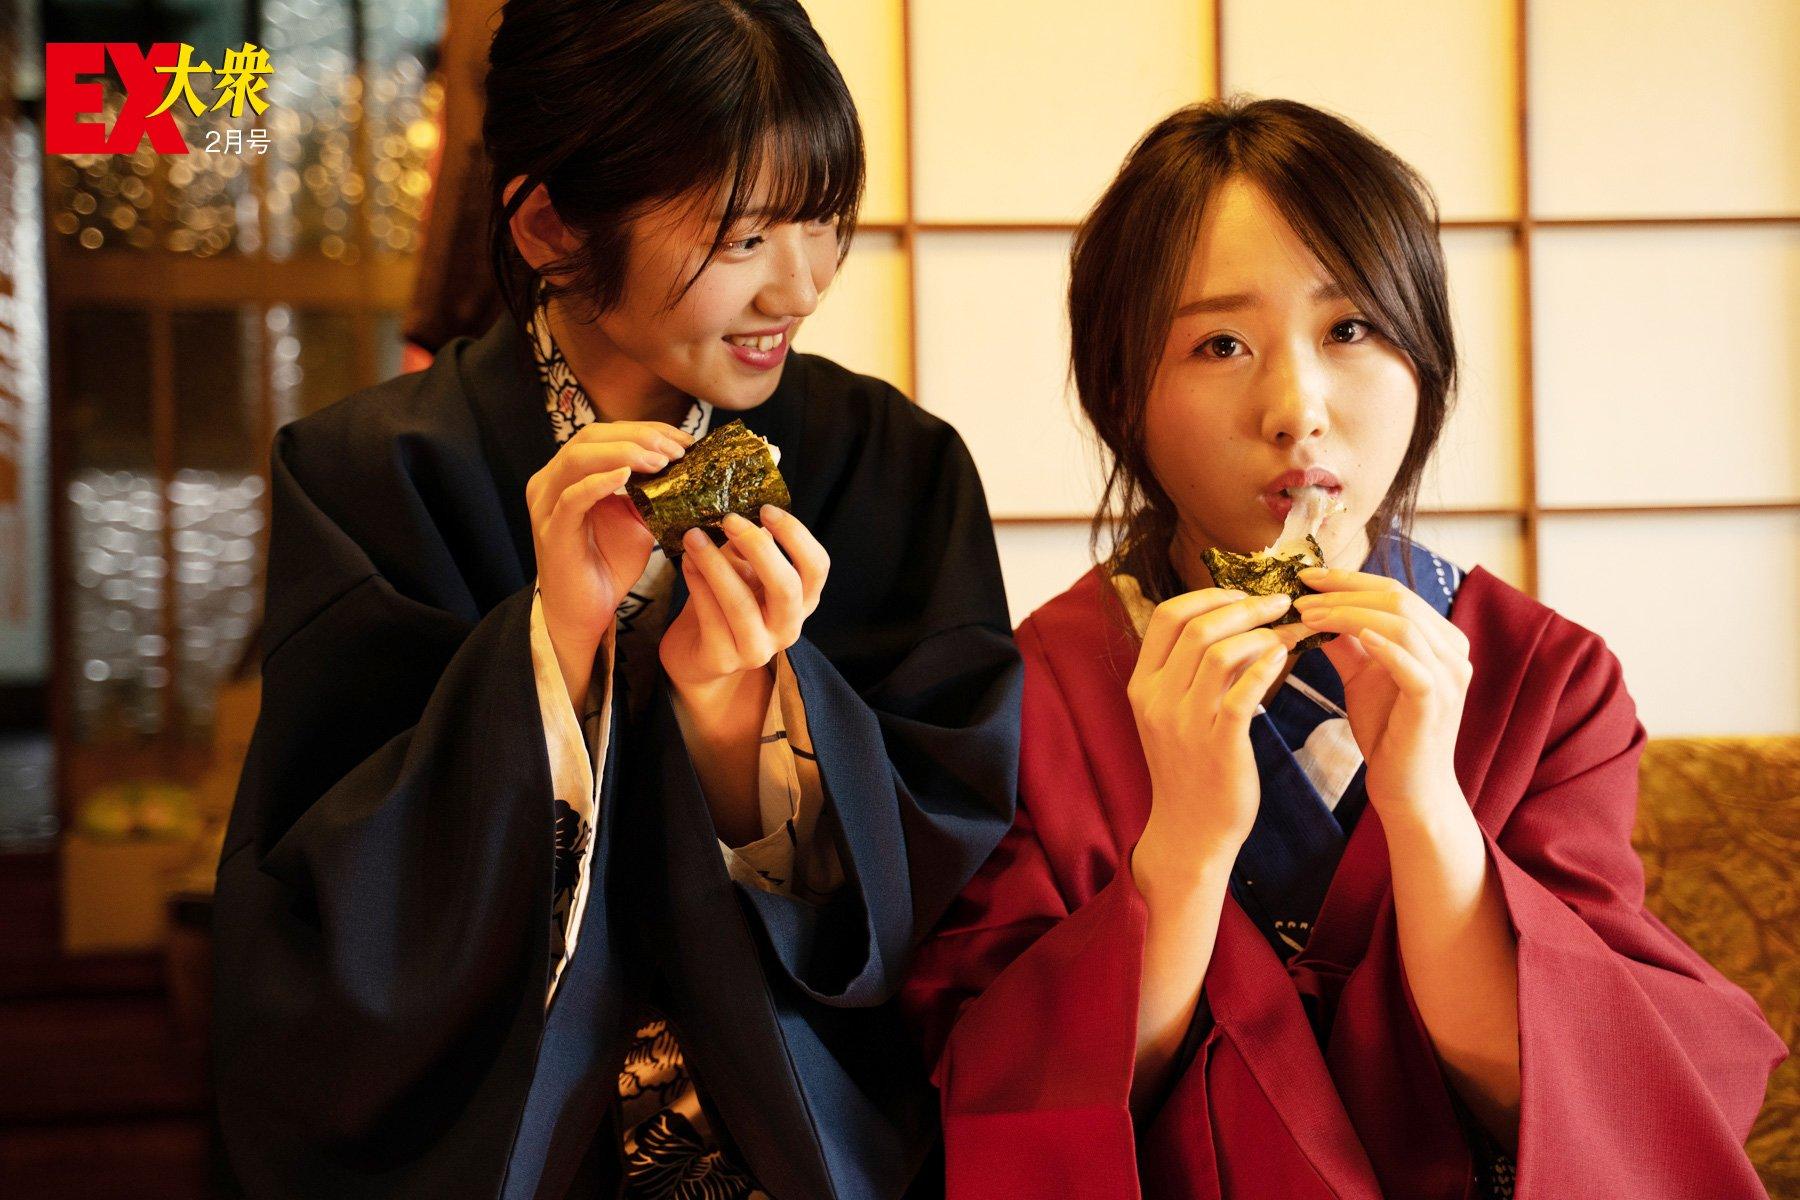 AKB48高橋朱里&村山彩希の本誌未掲載カット9枚を大公開!【EX大衆2月号】の画像007